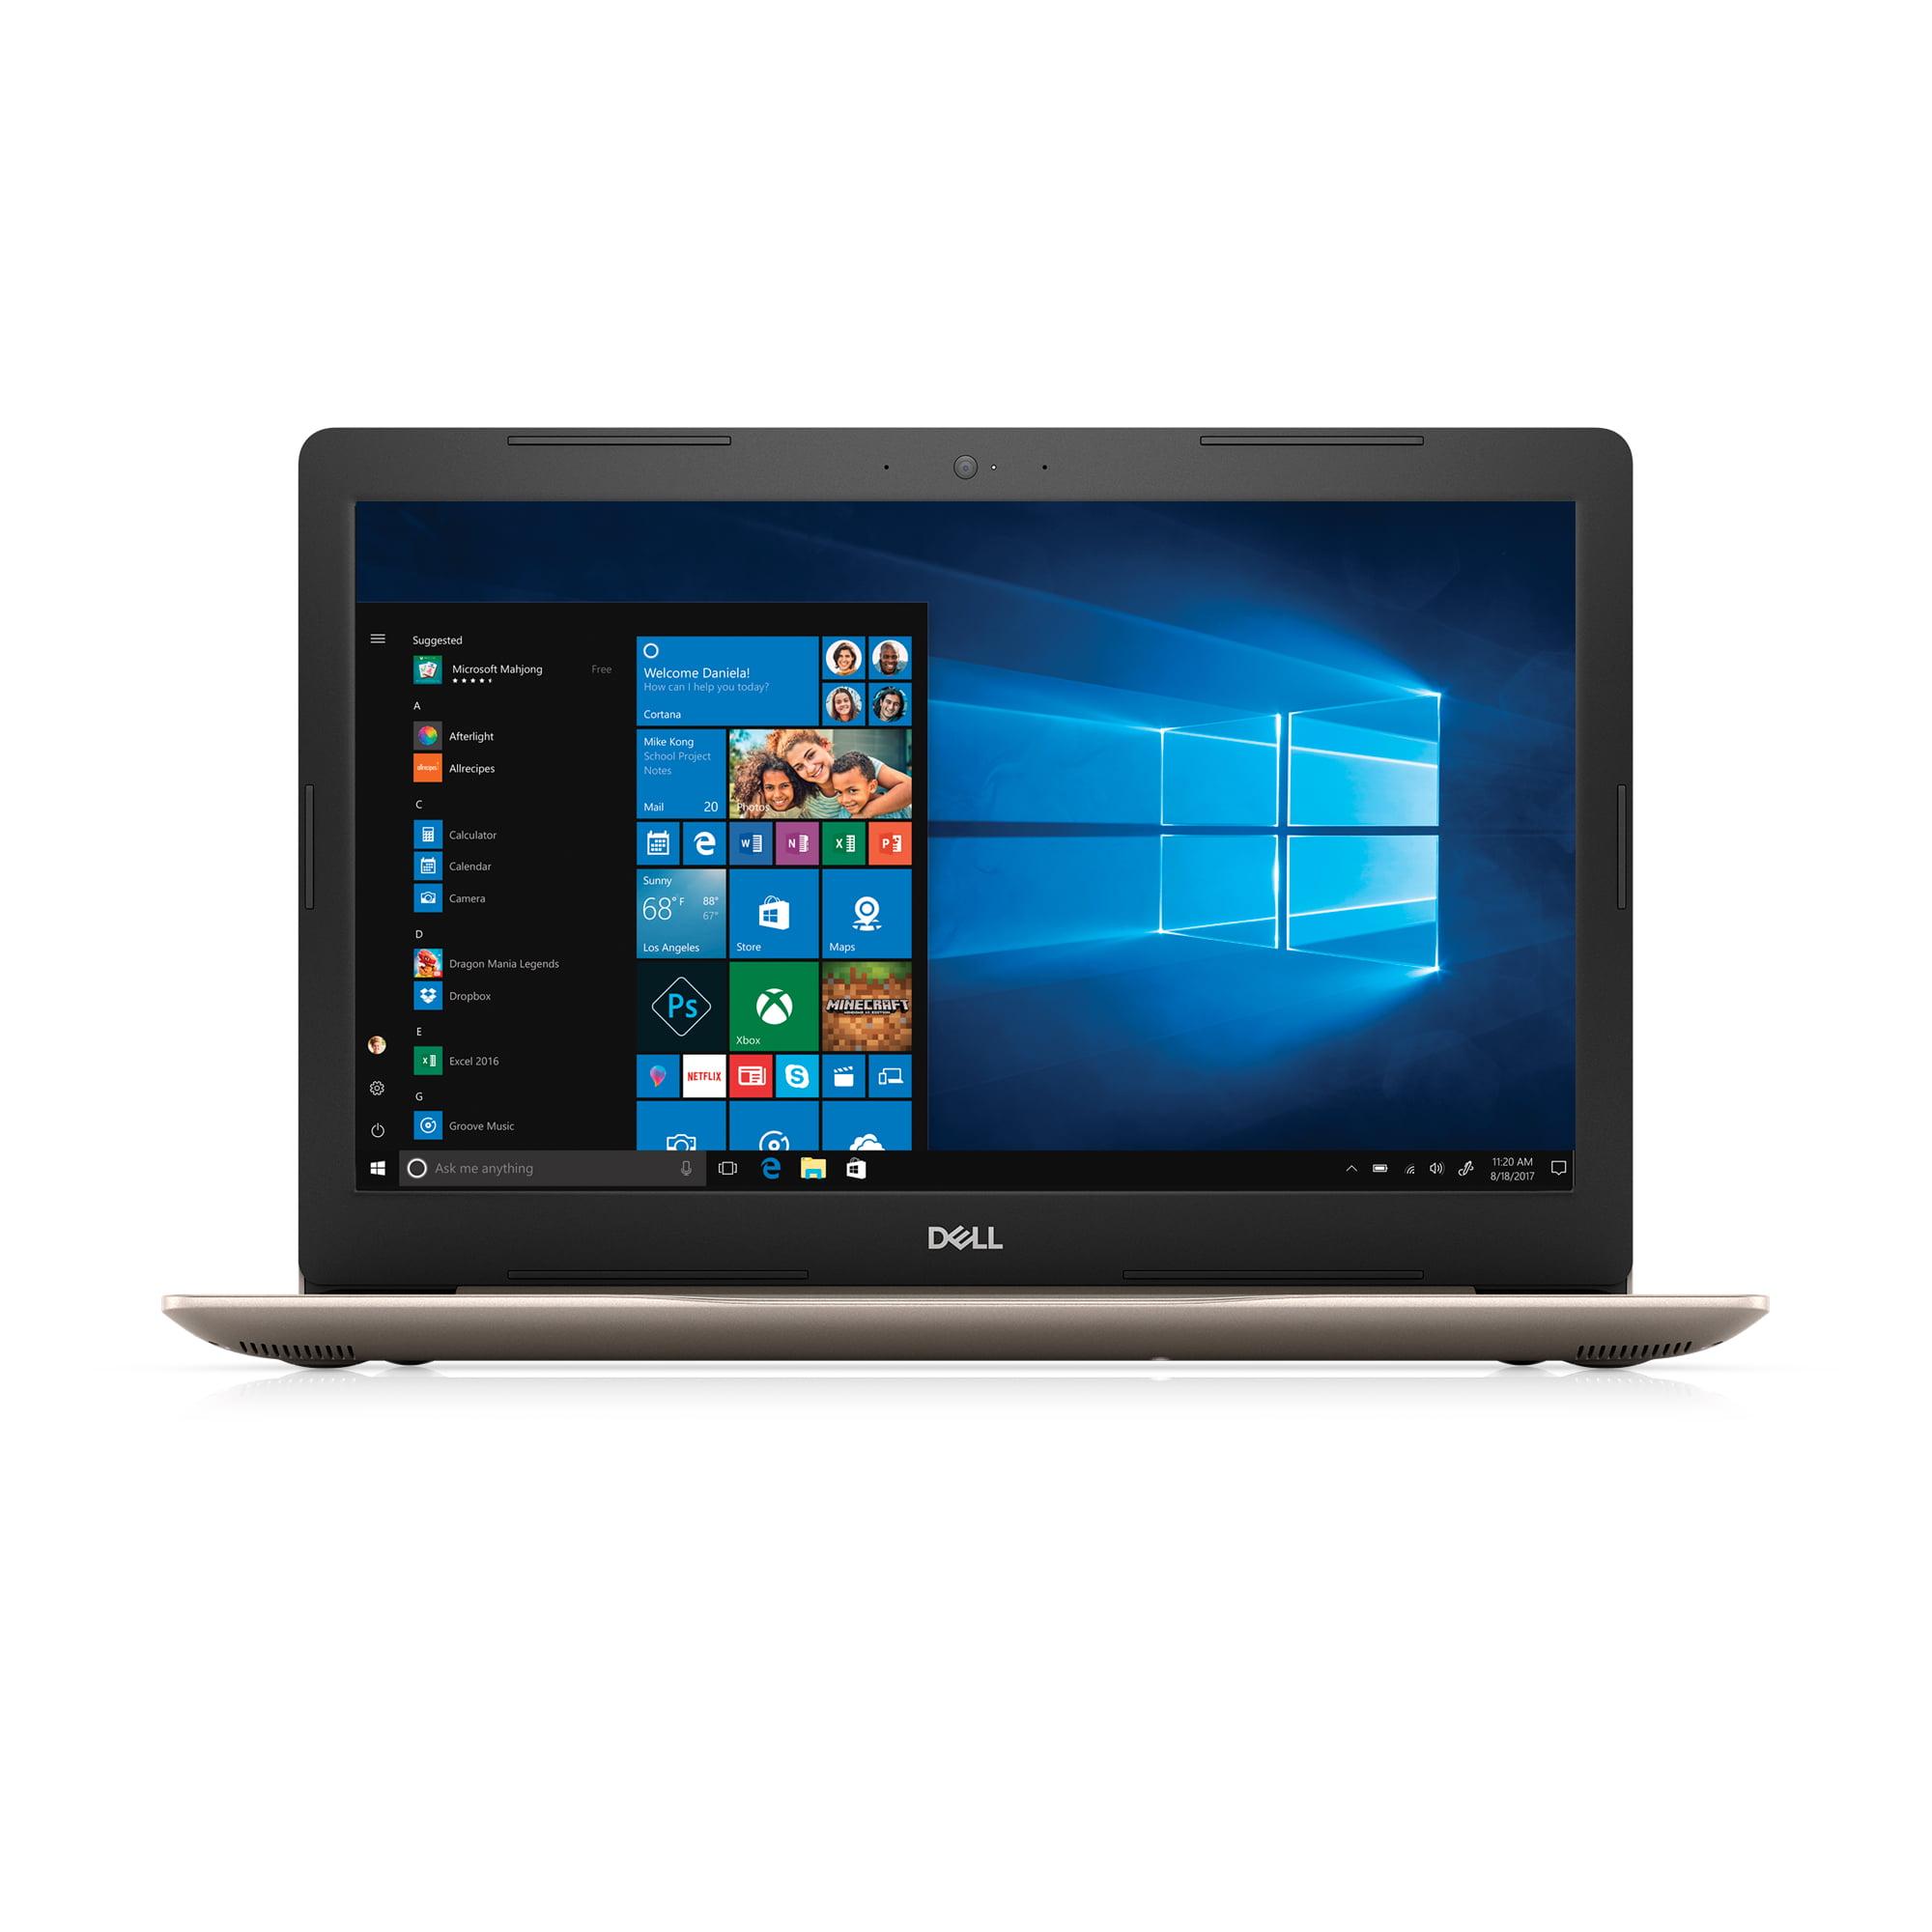 "Dell Inspiron 15 5000 (5570) Laptop, 15.6"", Intel® Core™ i3-7130U, Intel® UHD Graphics 620, 1TB HDD, 8GB RAM, i5570-3451GLD-PUS"